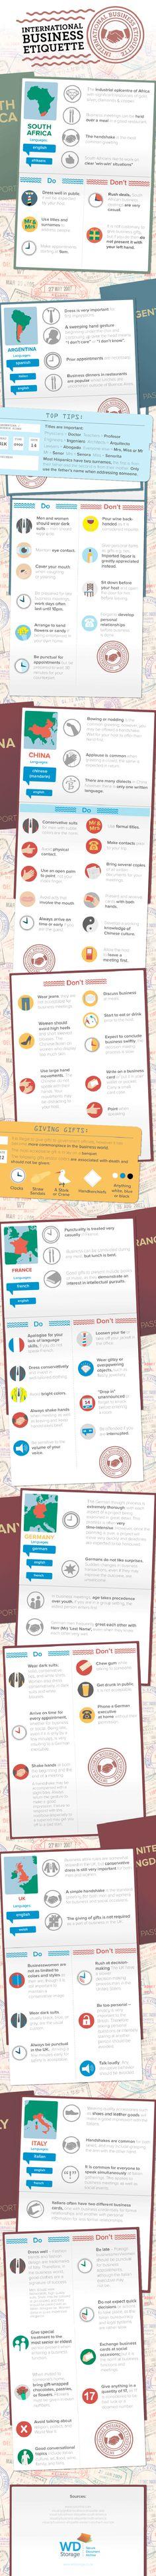 international_infografik